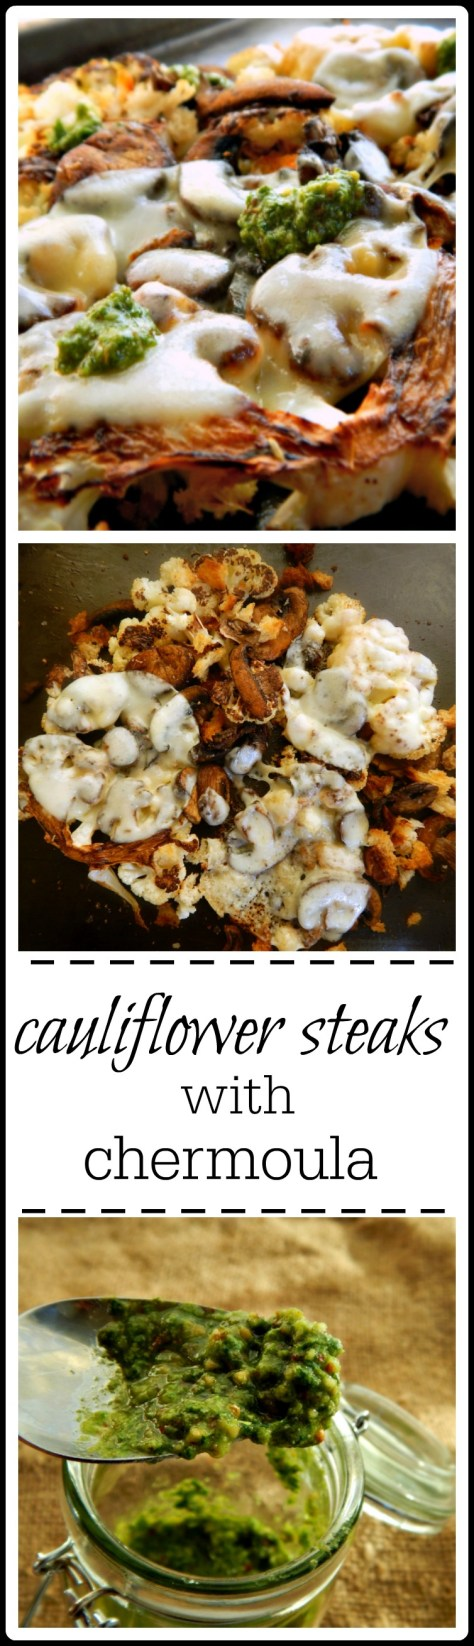 Roasted Cauliflower Steaks with Chermoula Sauce